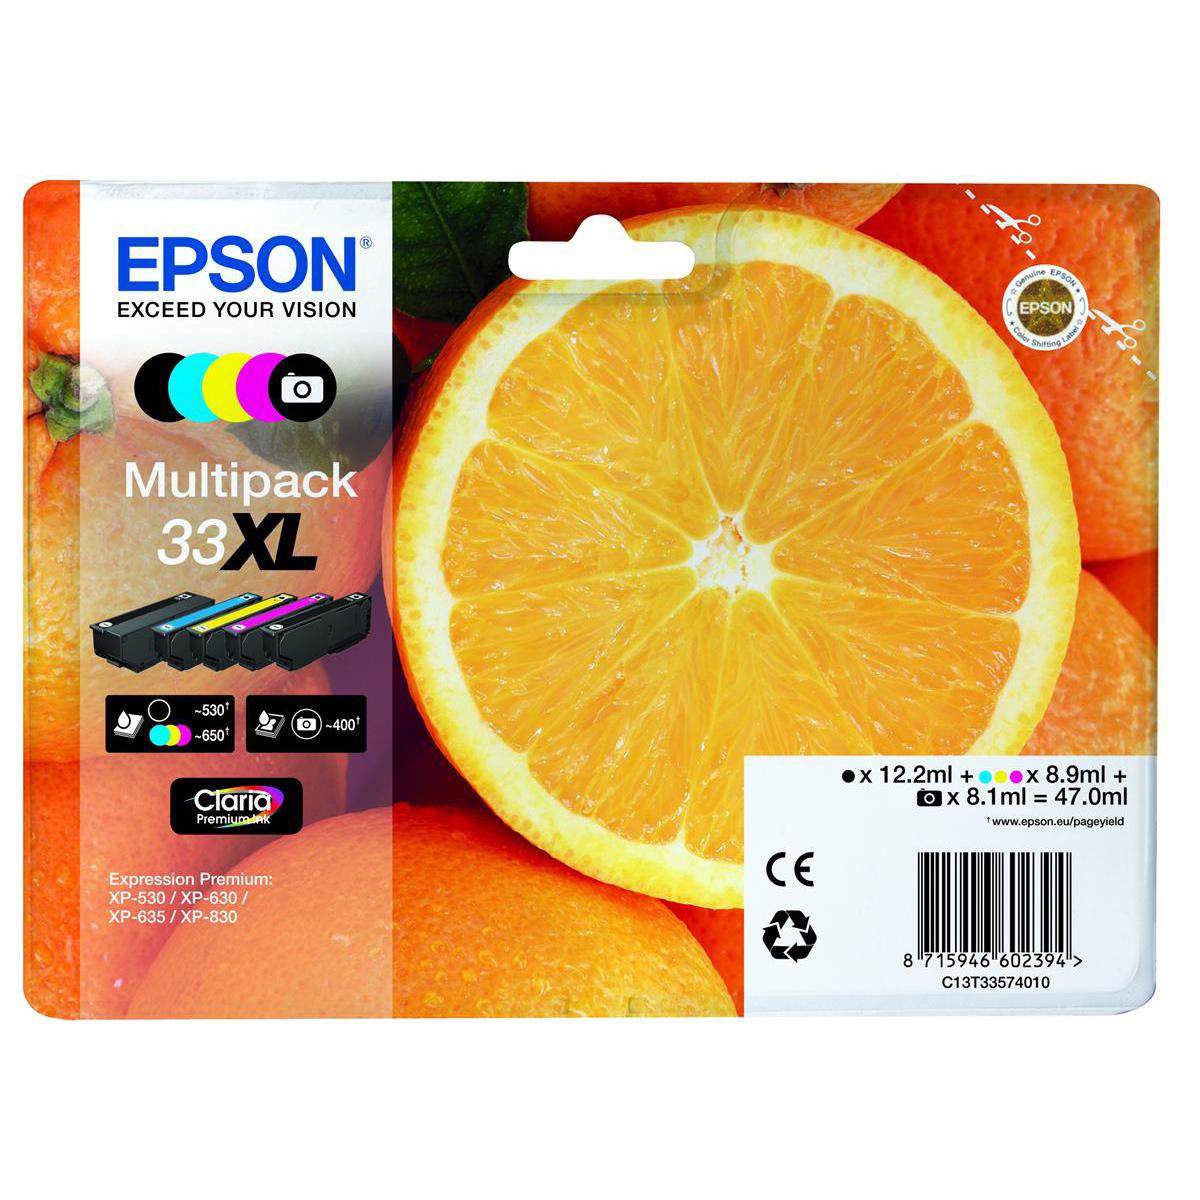 Inkjet Cartridges Epson T33XLInkjetCart OrangeHYBlack12.ml/PhotoBlack 8.1ml/Cyan/Mag/Yellow 8.9ml Ref C13T33574010 Pack 5